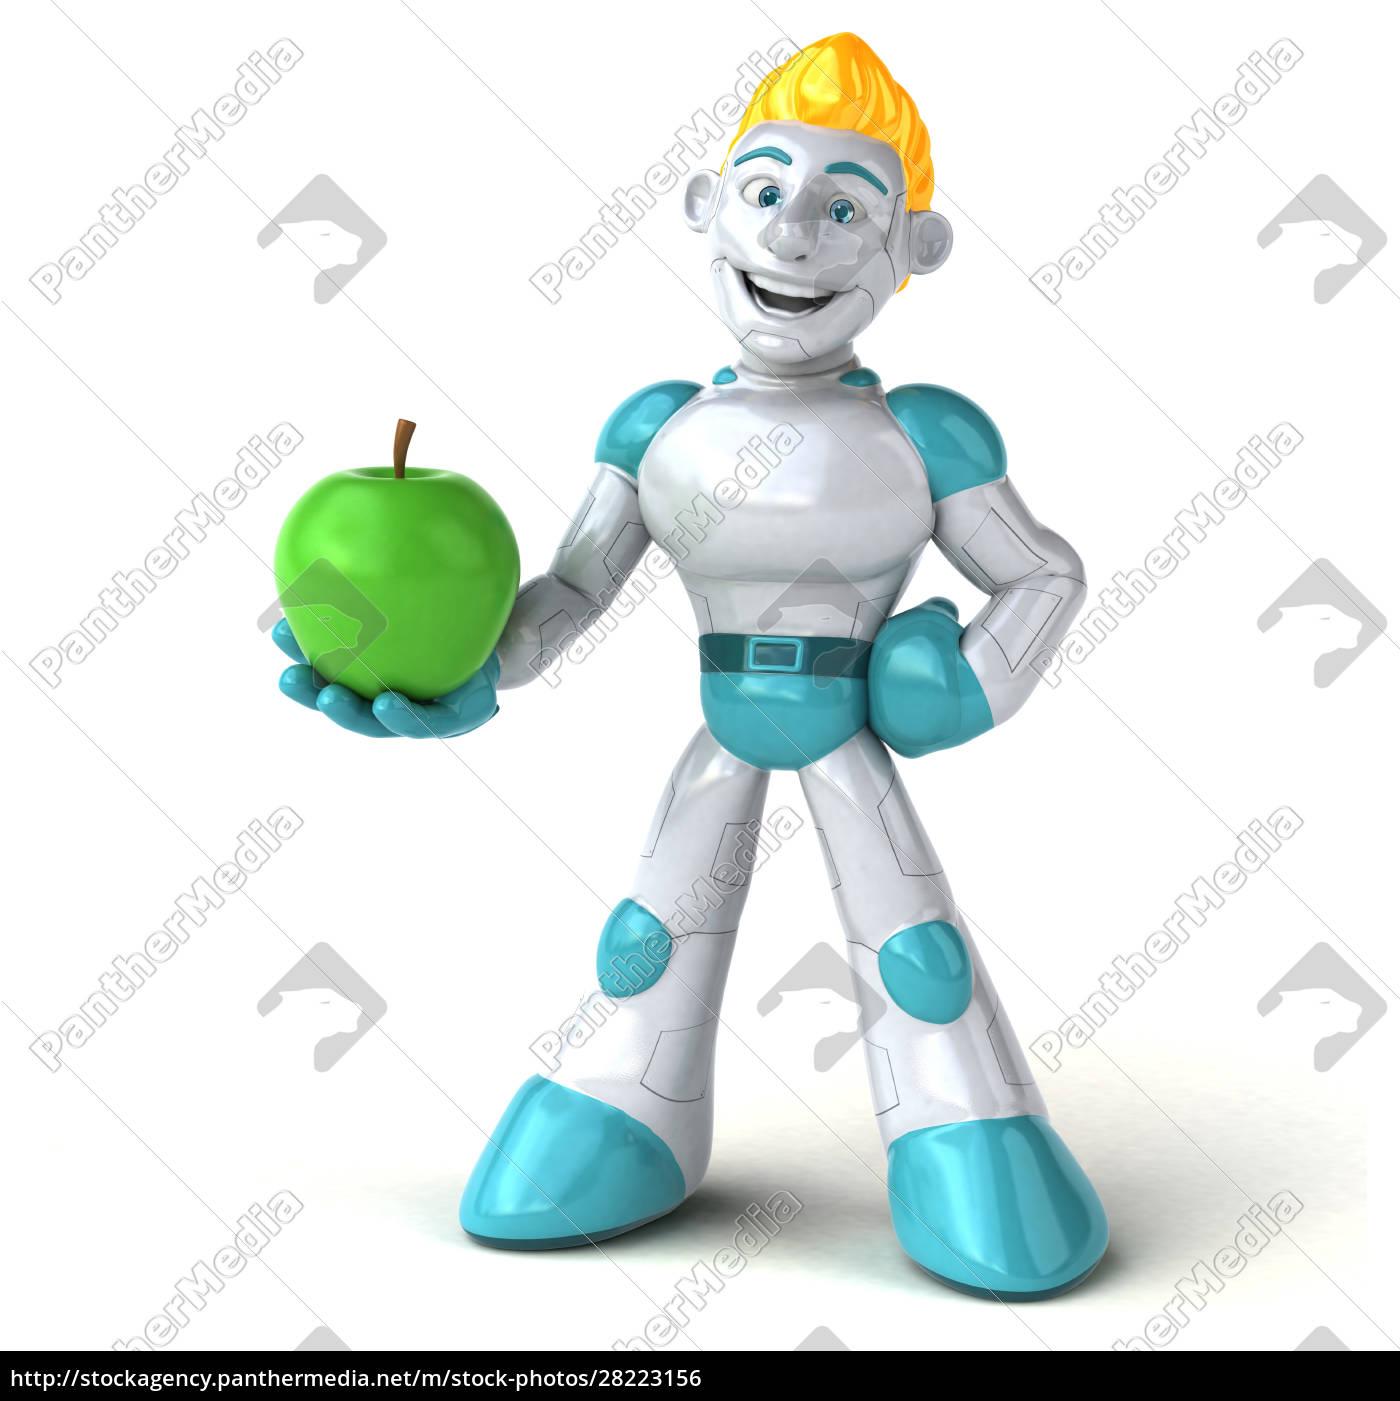 robot, -, 3d, illustration - 28223156